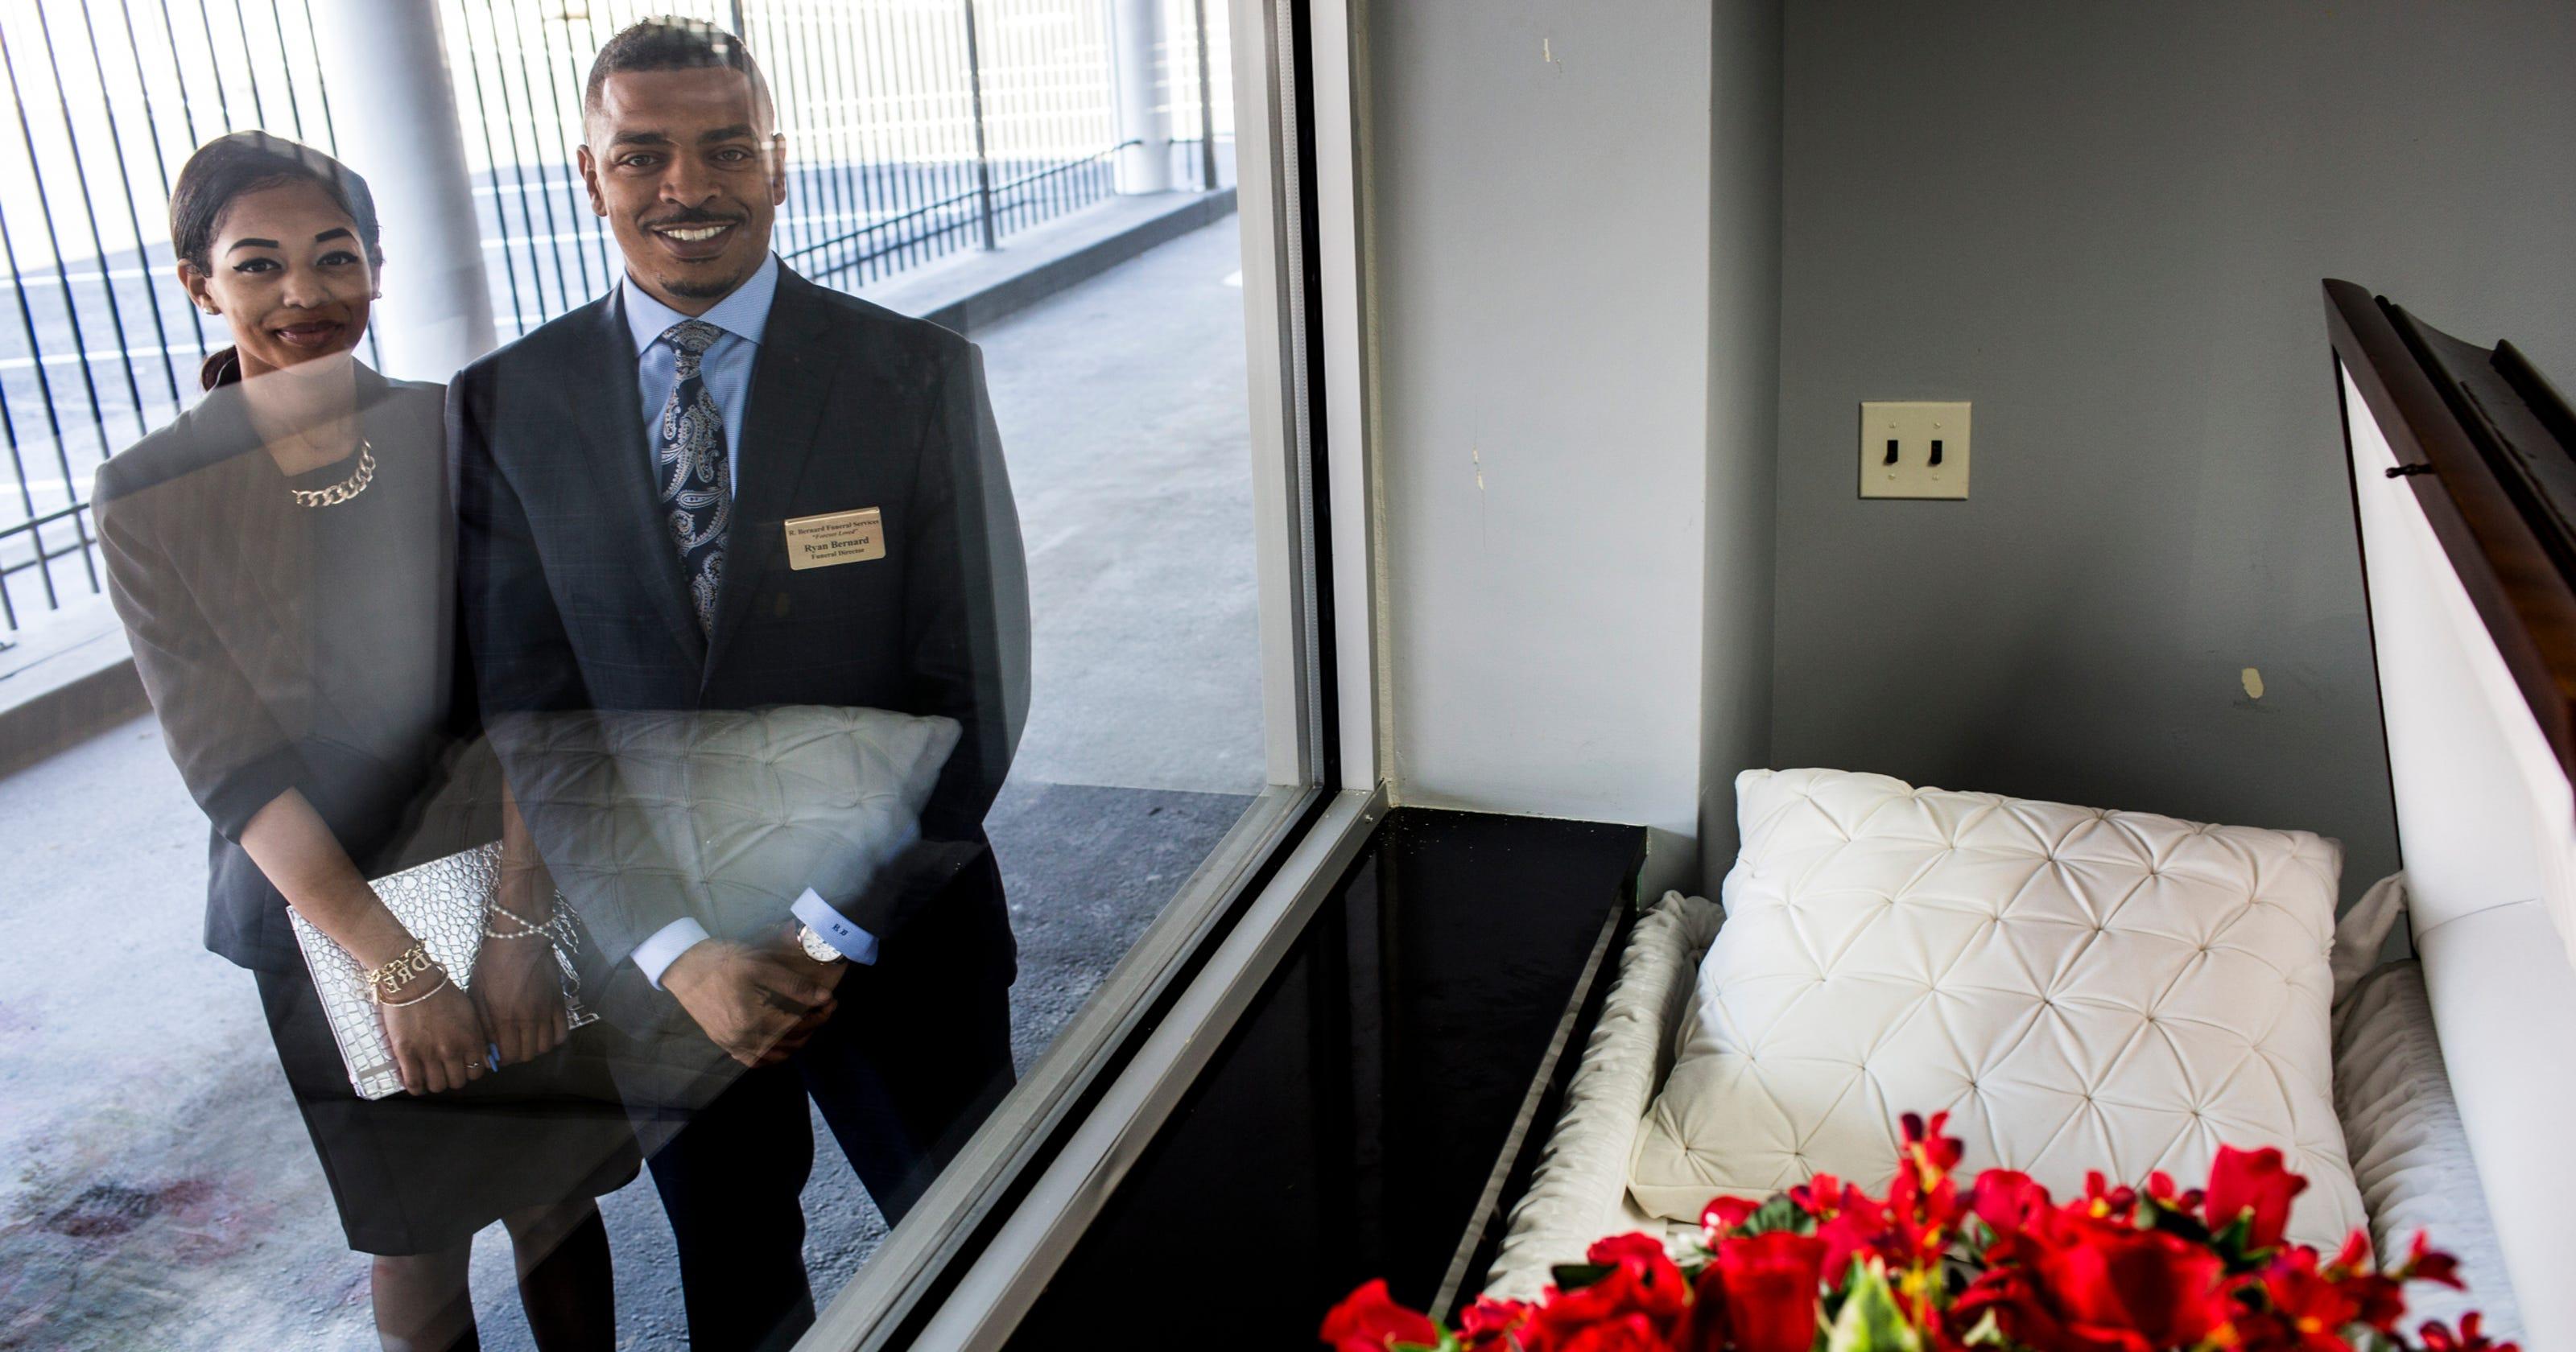 Funeral home in orange mound offers drive thru viewing izmirmasajfo